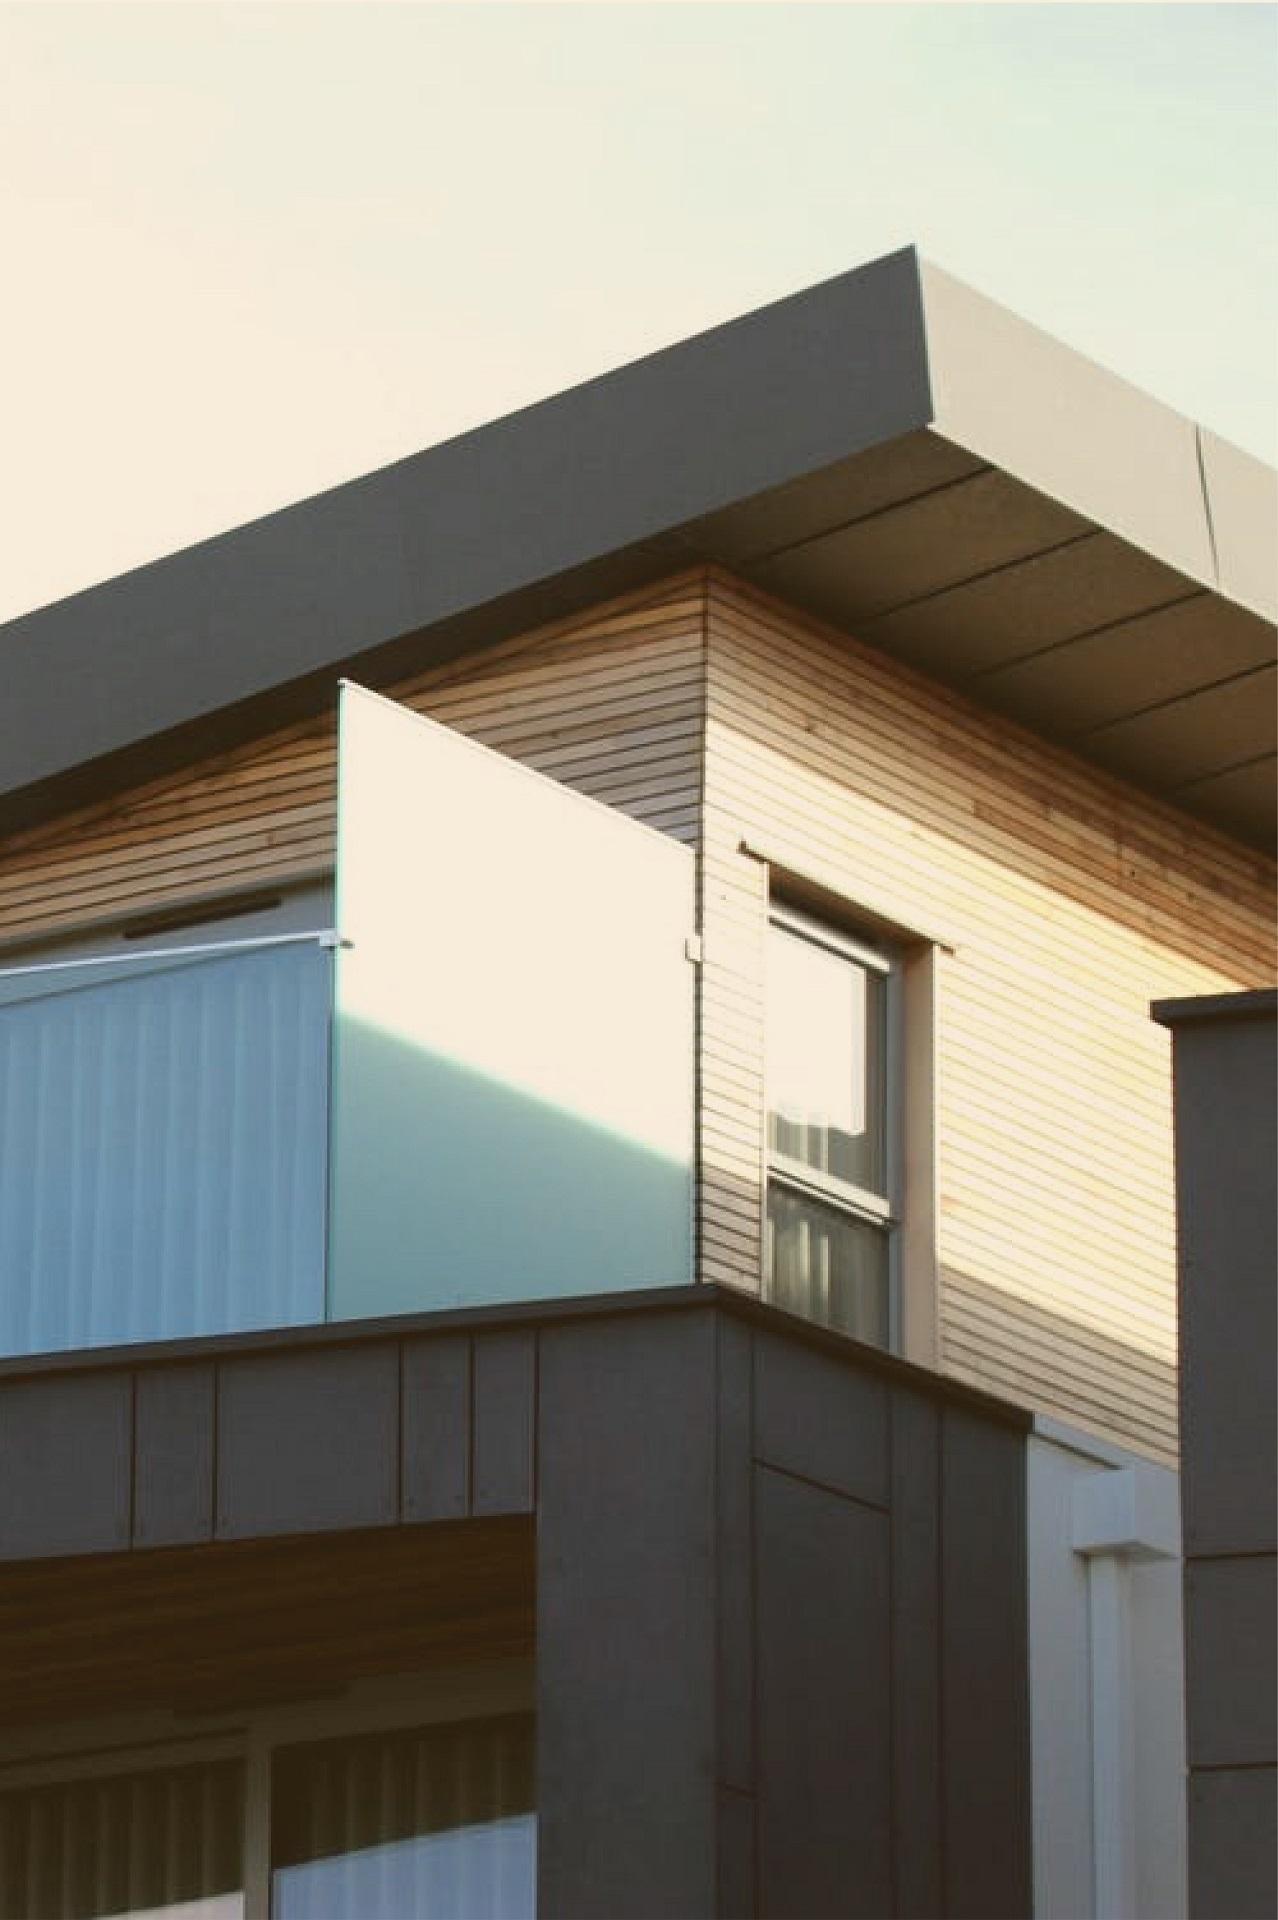 habilitation rénovation extension garage